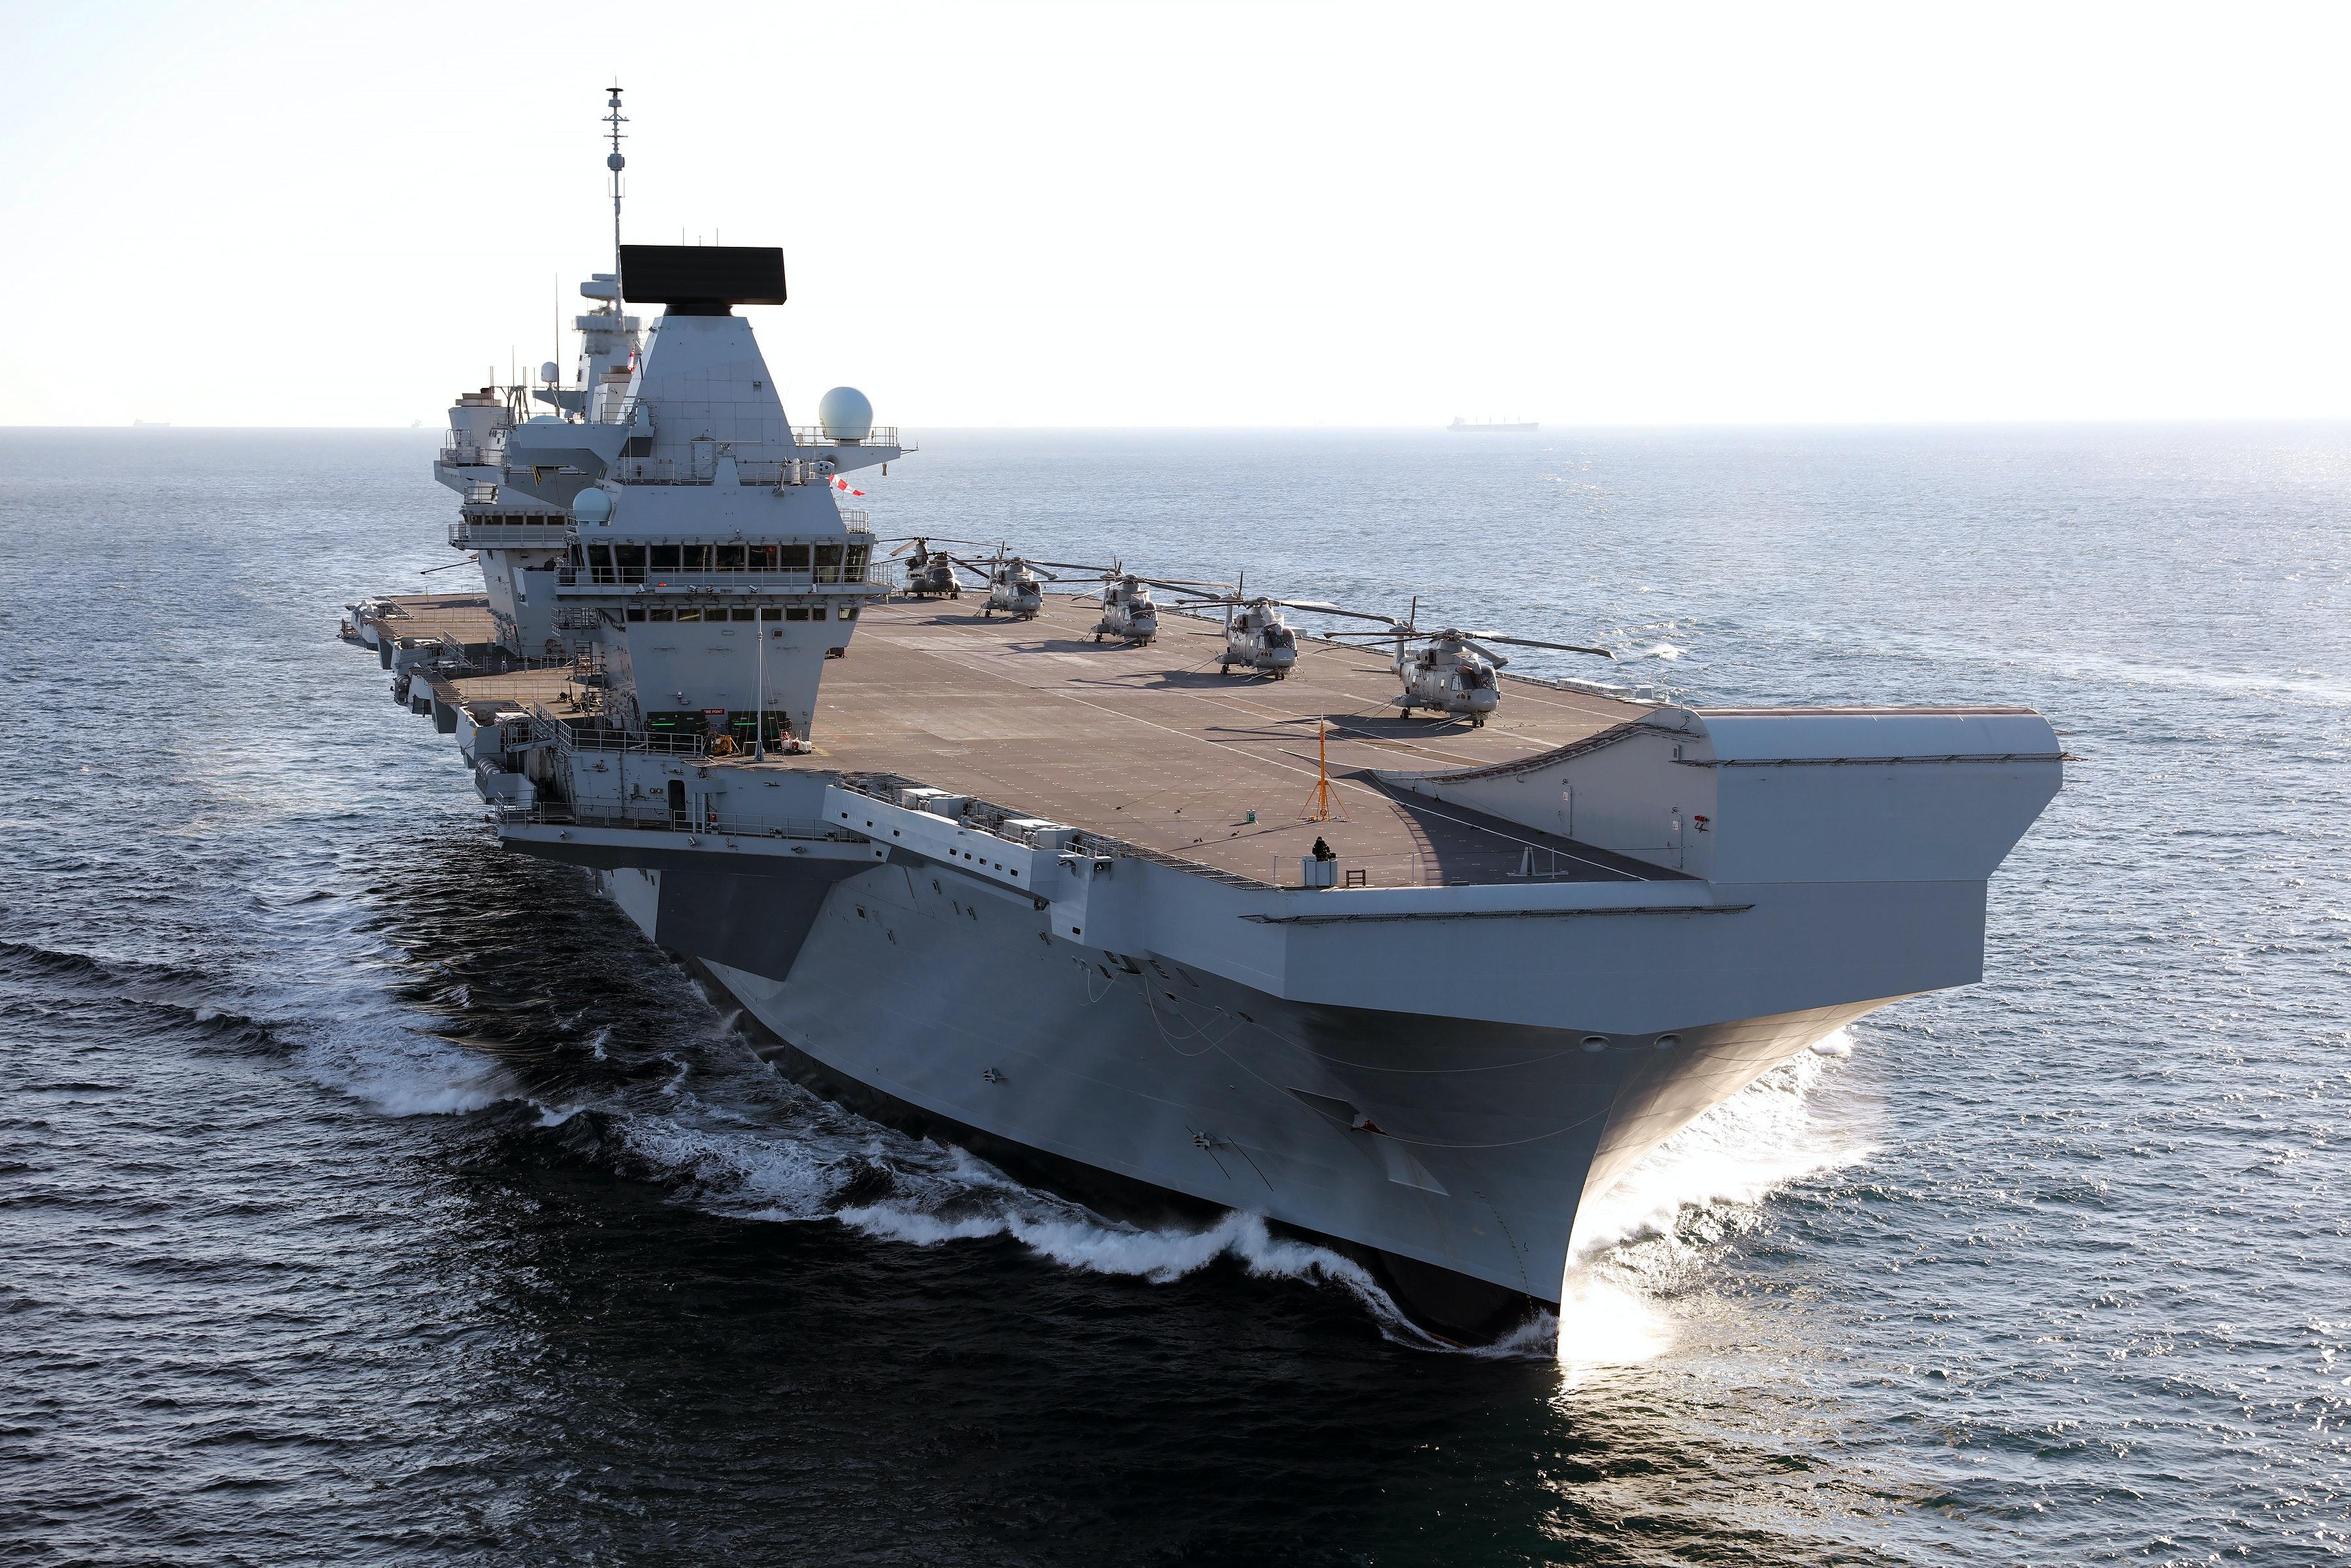 HMS QUEEN ELIZABETH ARRIVES IN GIBRALTAR FOR FIRST OVERSEAS VISIT